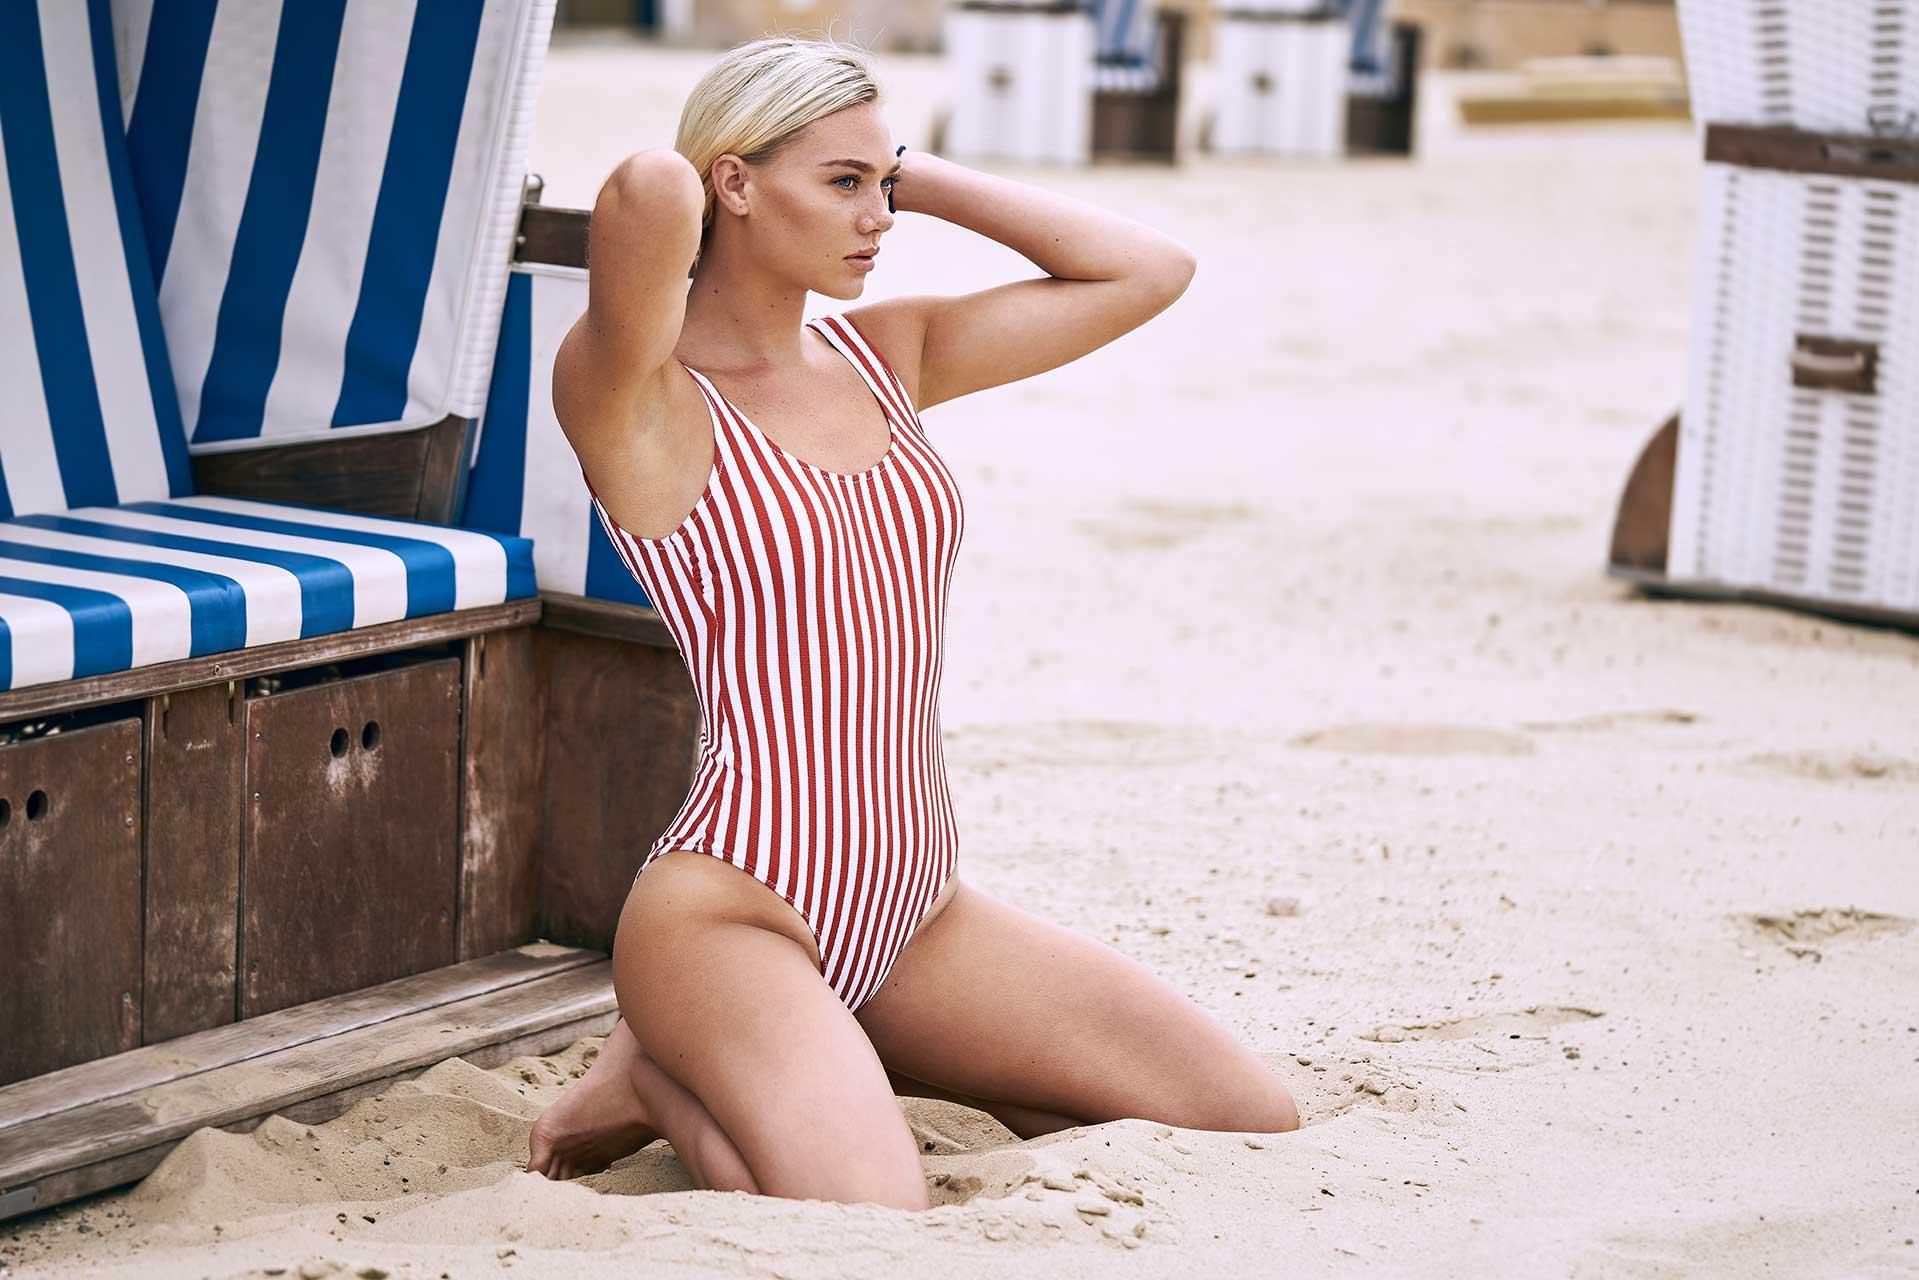 Beachbody: Bikinifigur im Sommer 2019